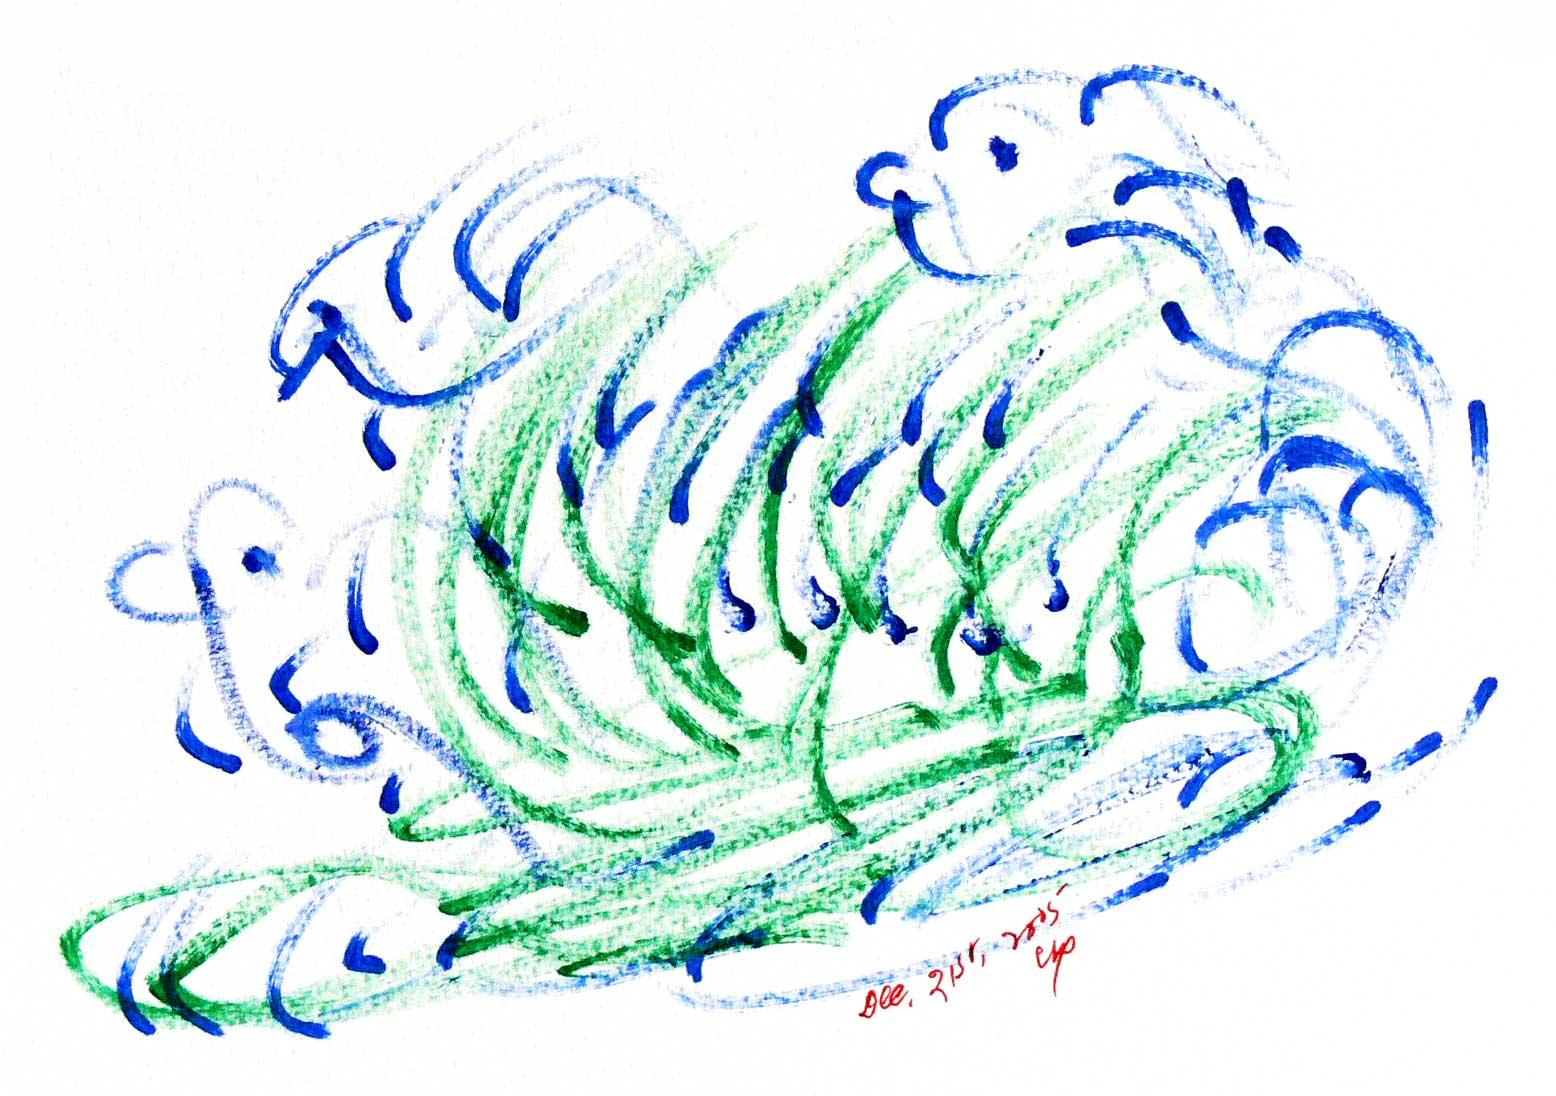 _Bird-Drawing-by-Sri-Chinmoy-21-12-2005-5-